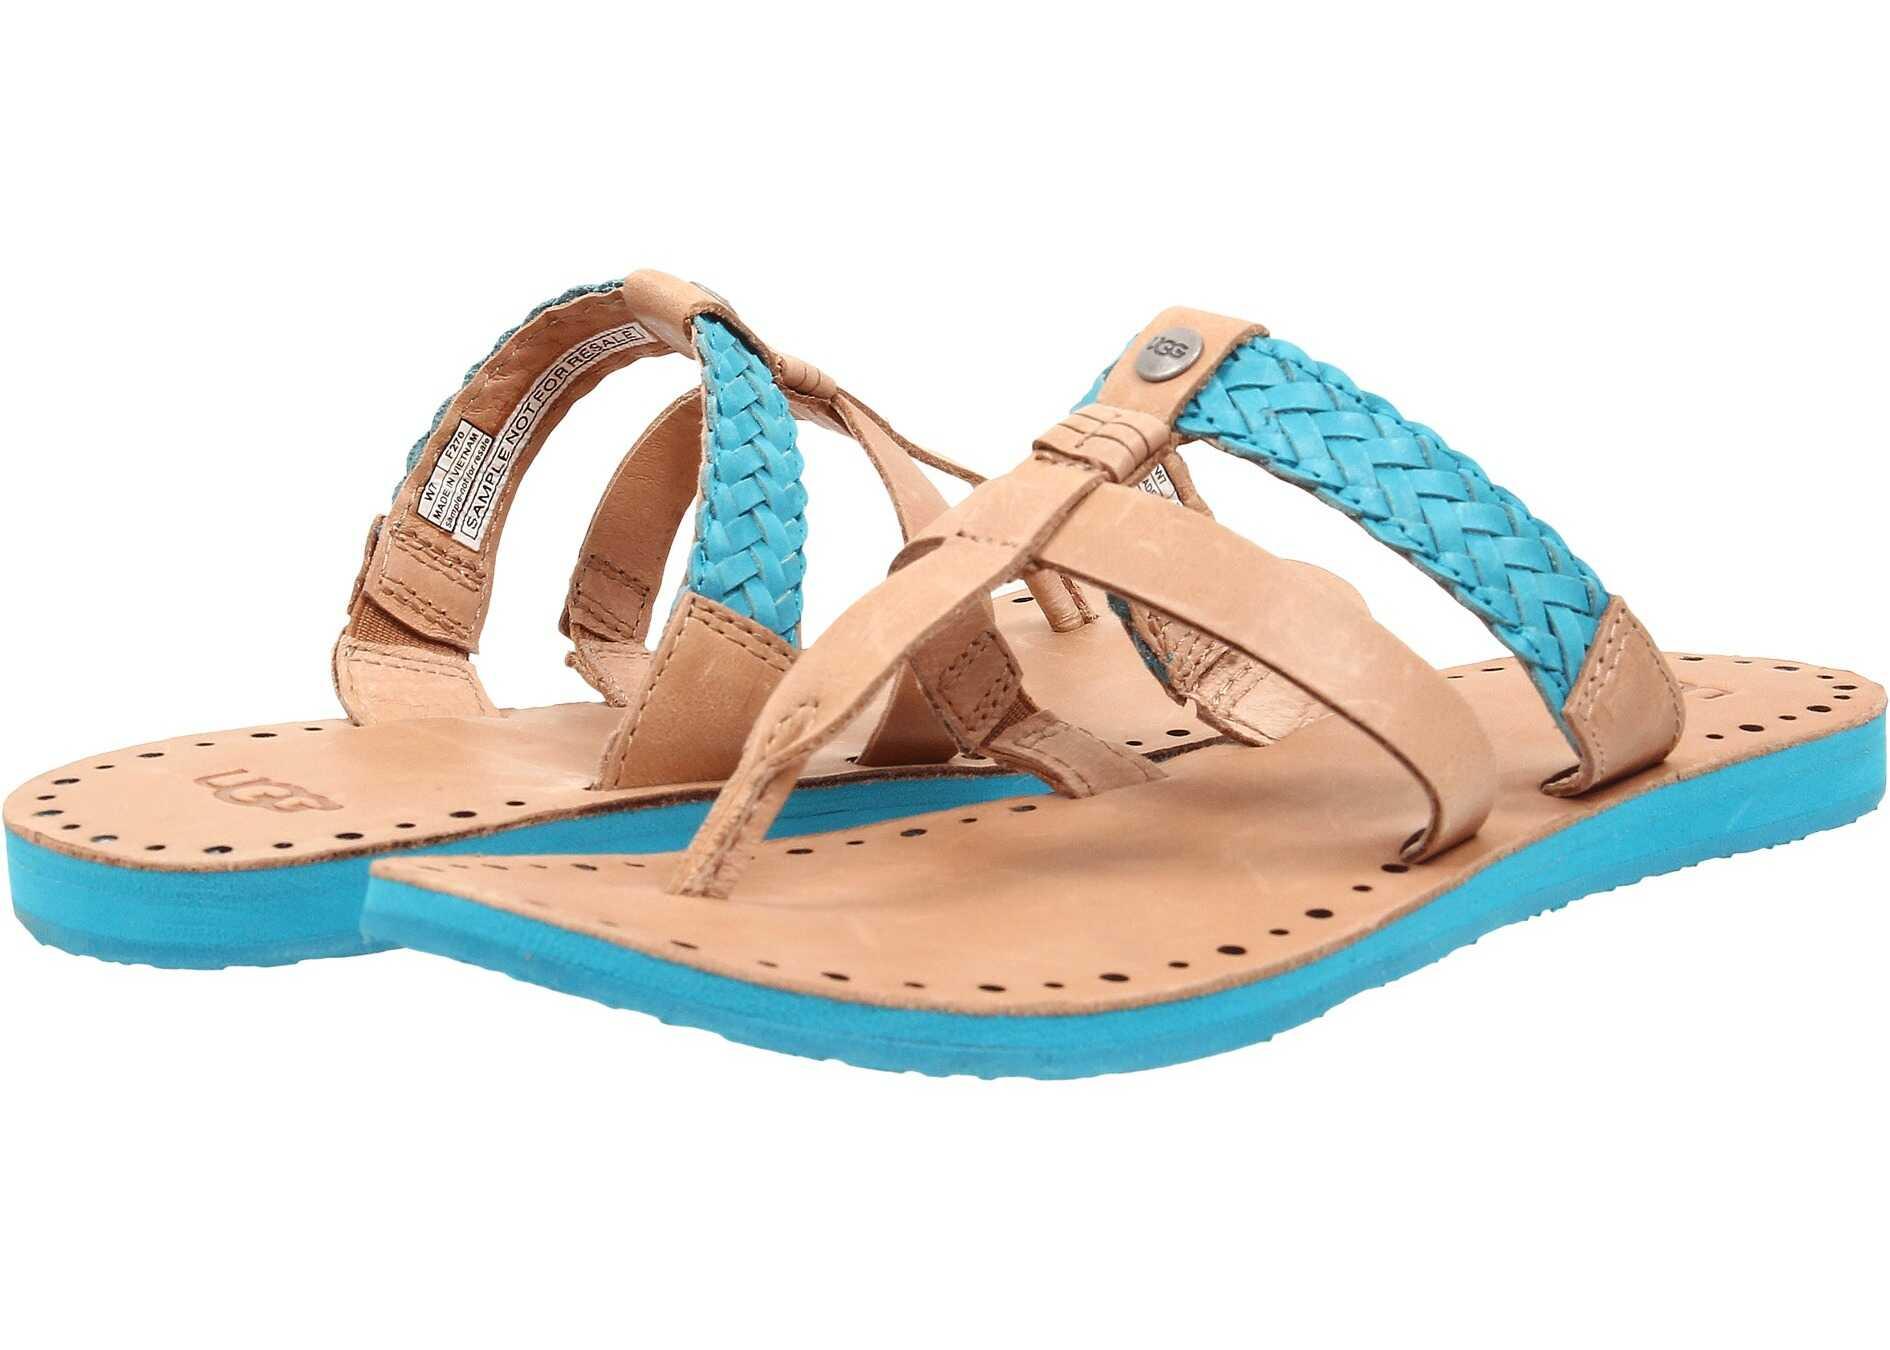 UGG Audra Surf Blue Leather